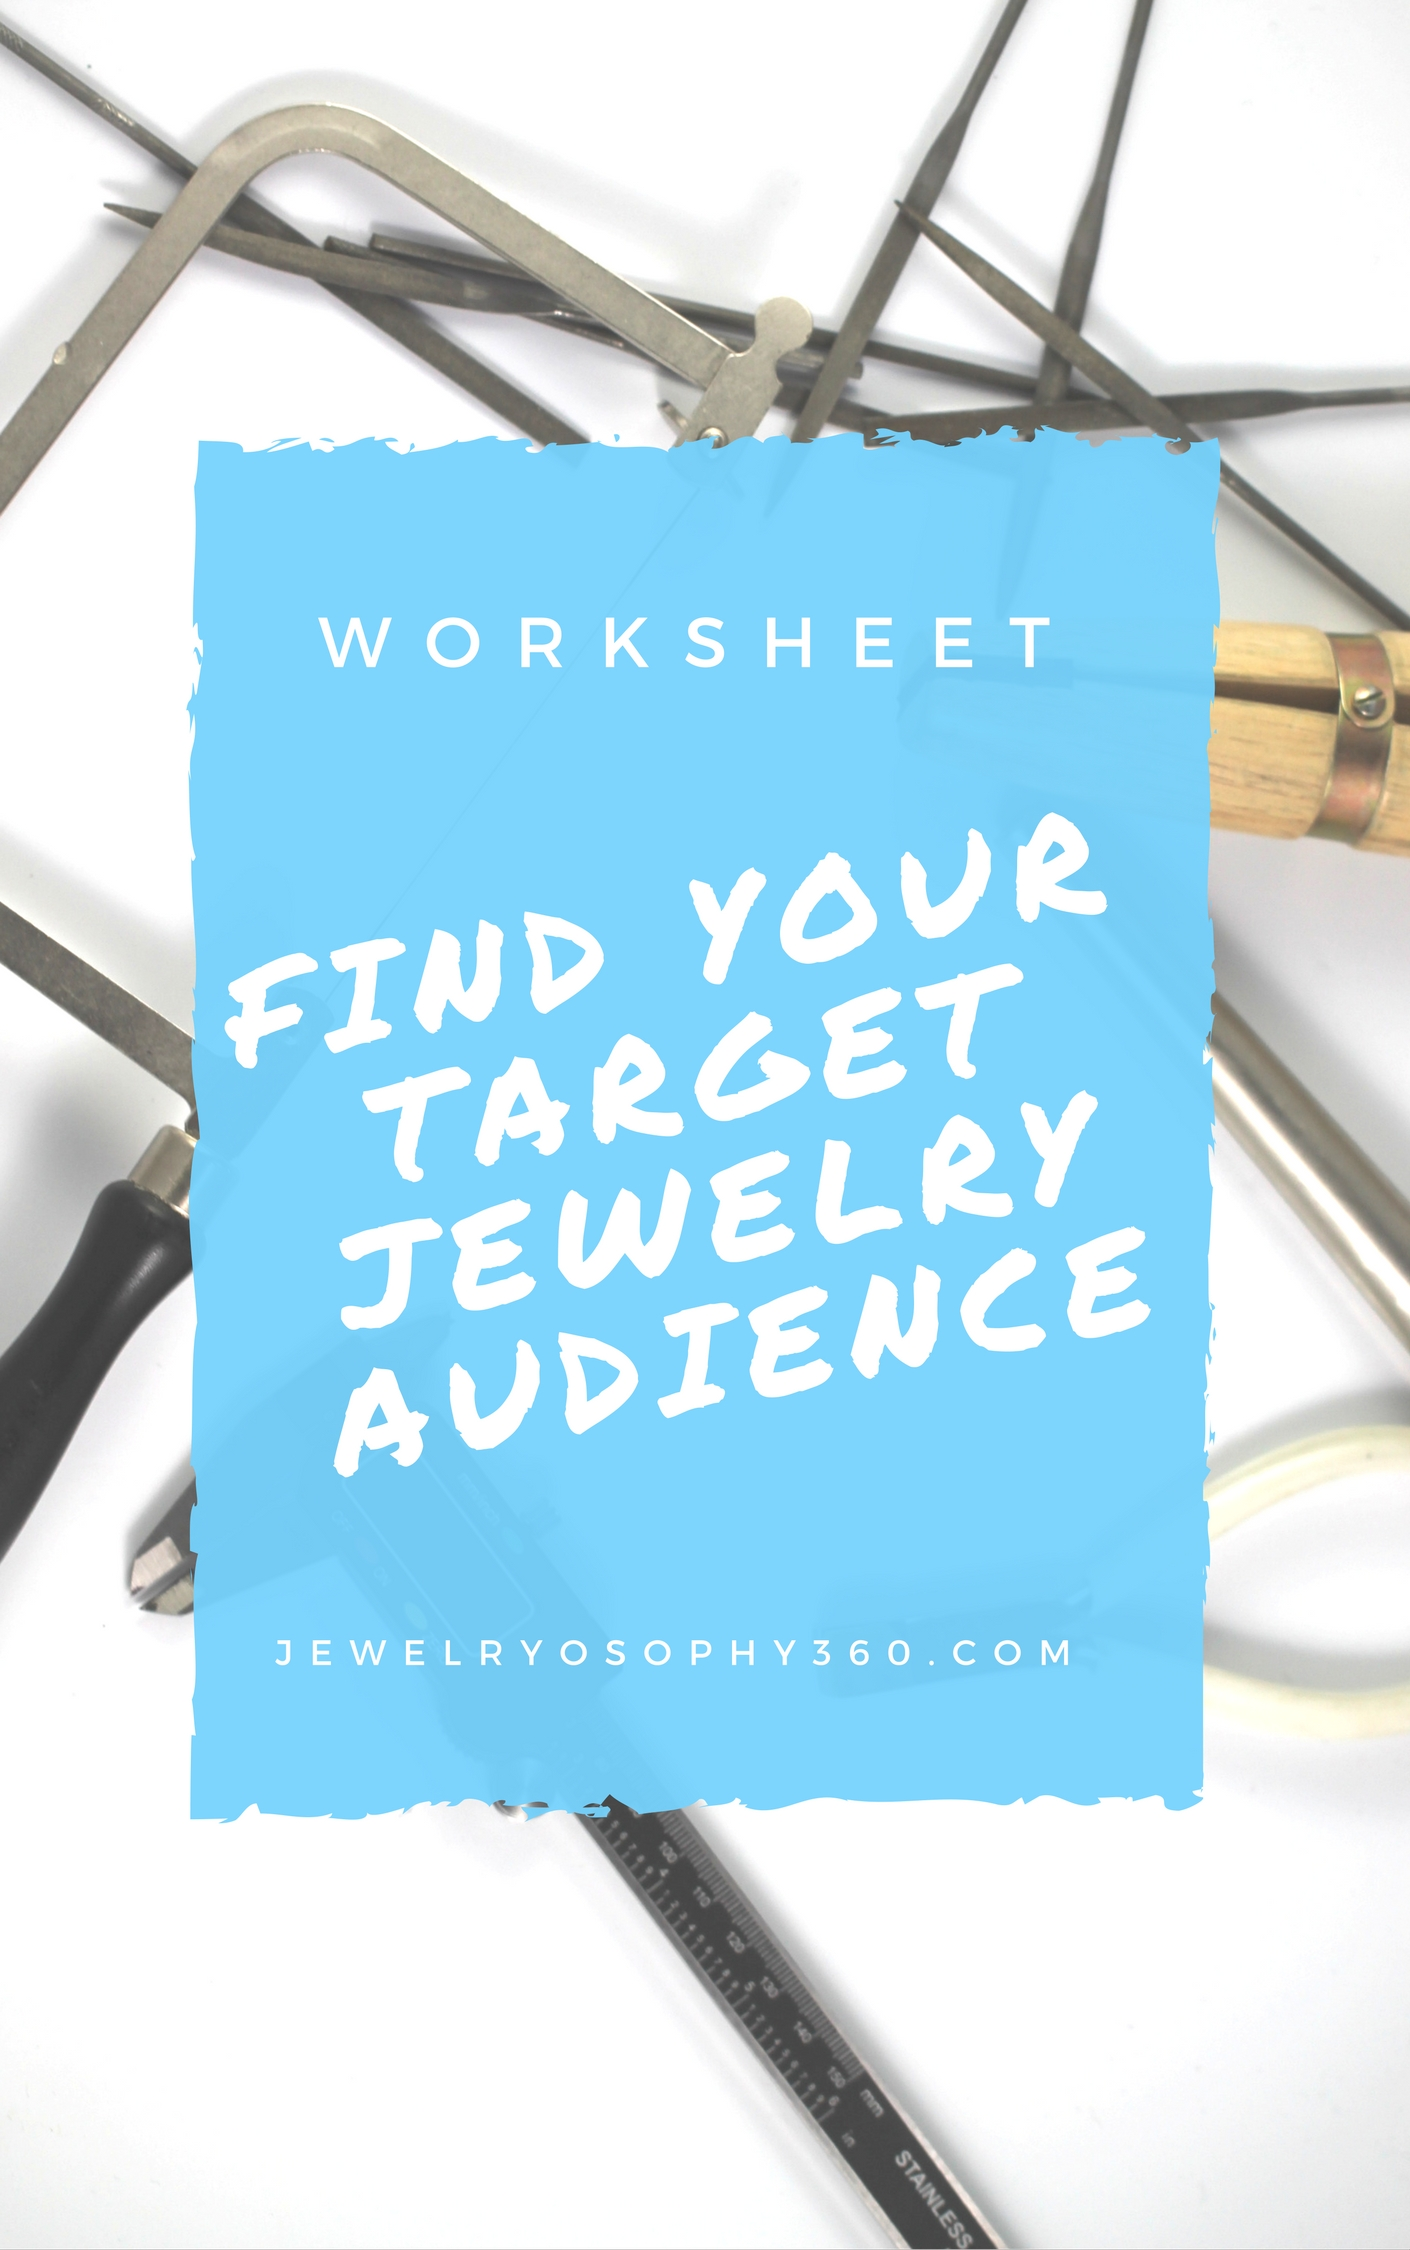 target jewelry audience.jpg